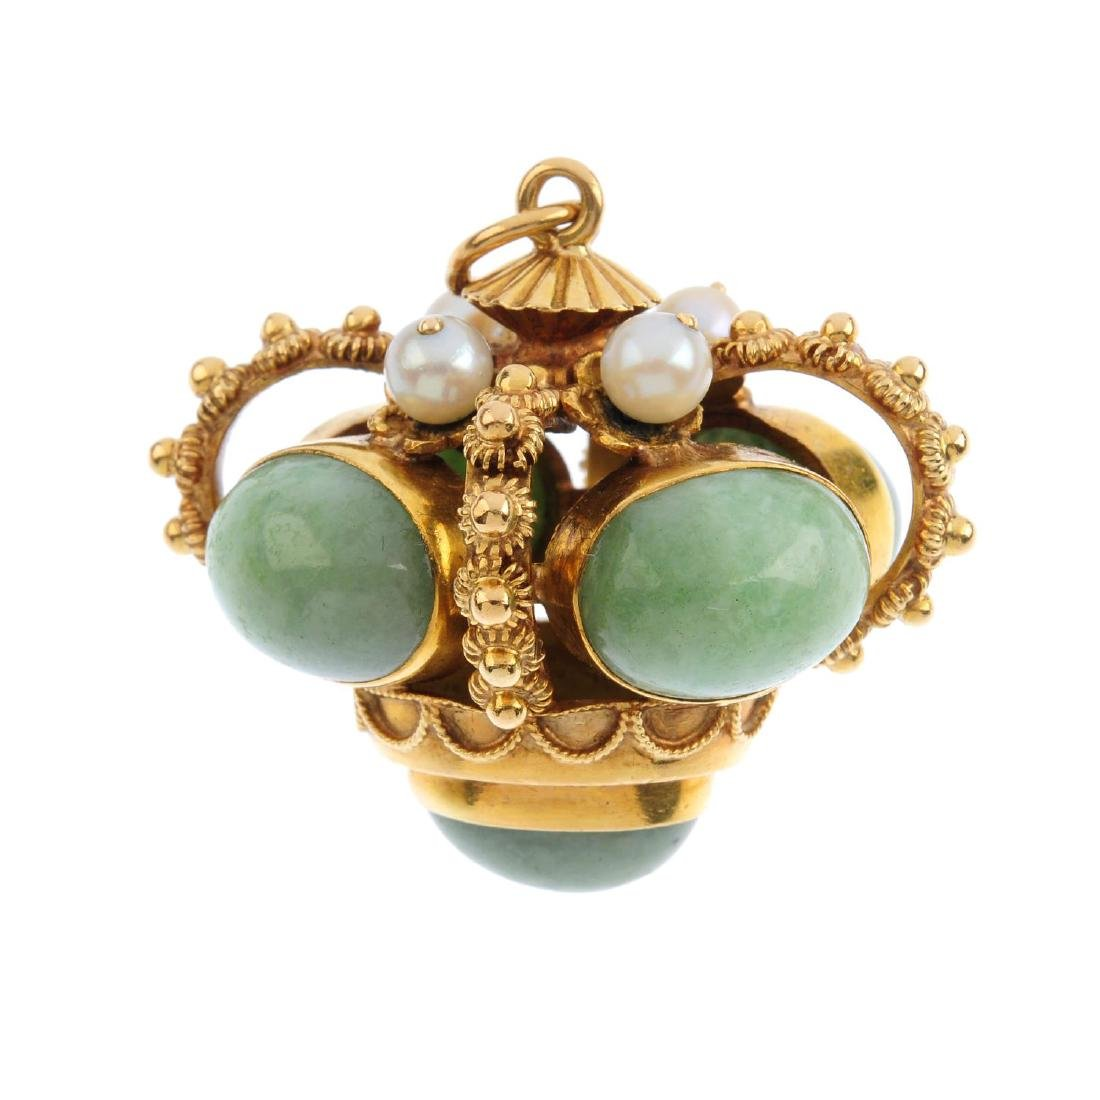 A gem-set fob. The oval green gem cabochon collets,